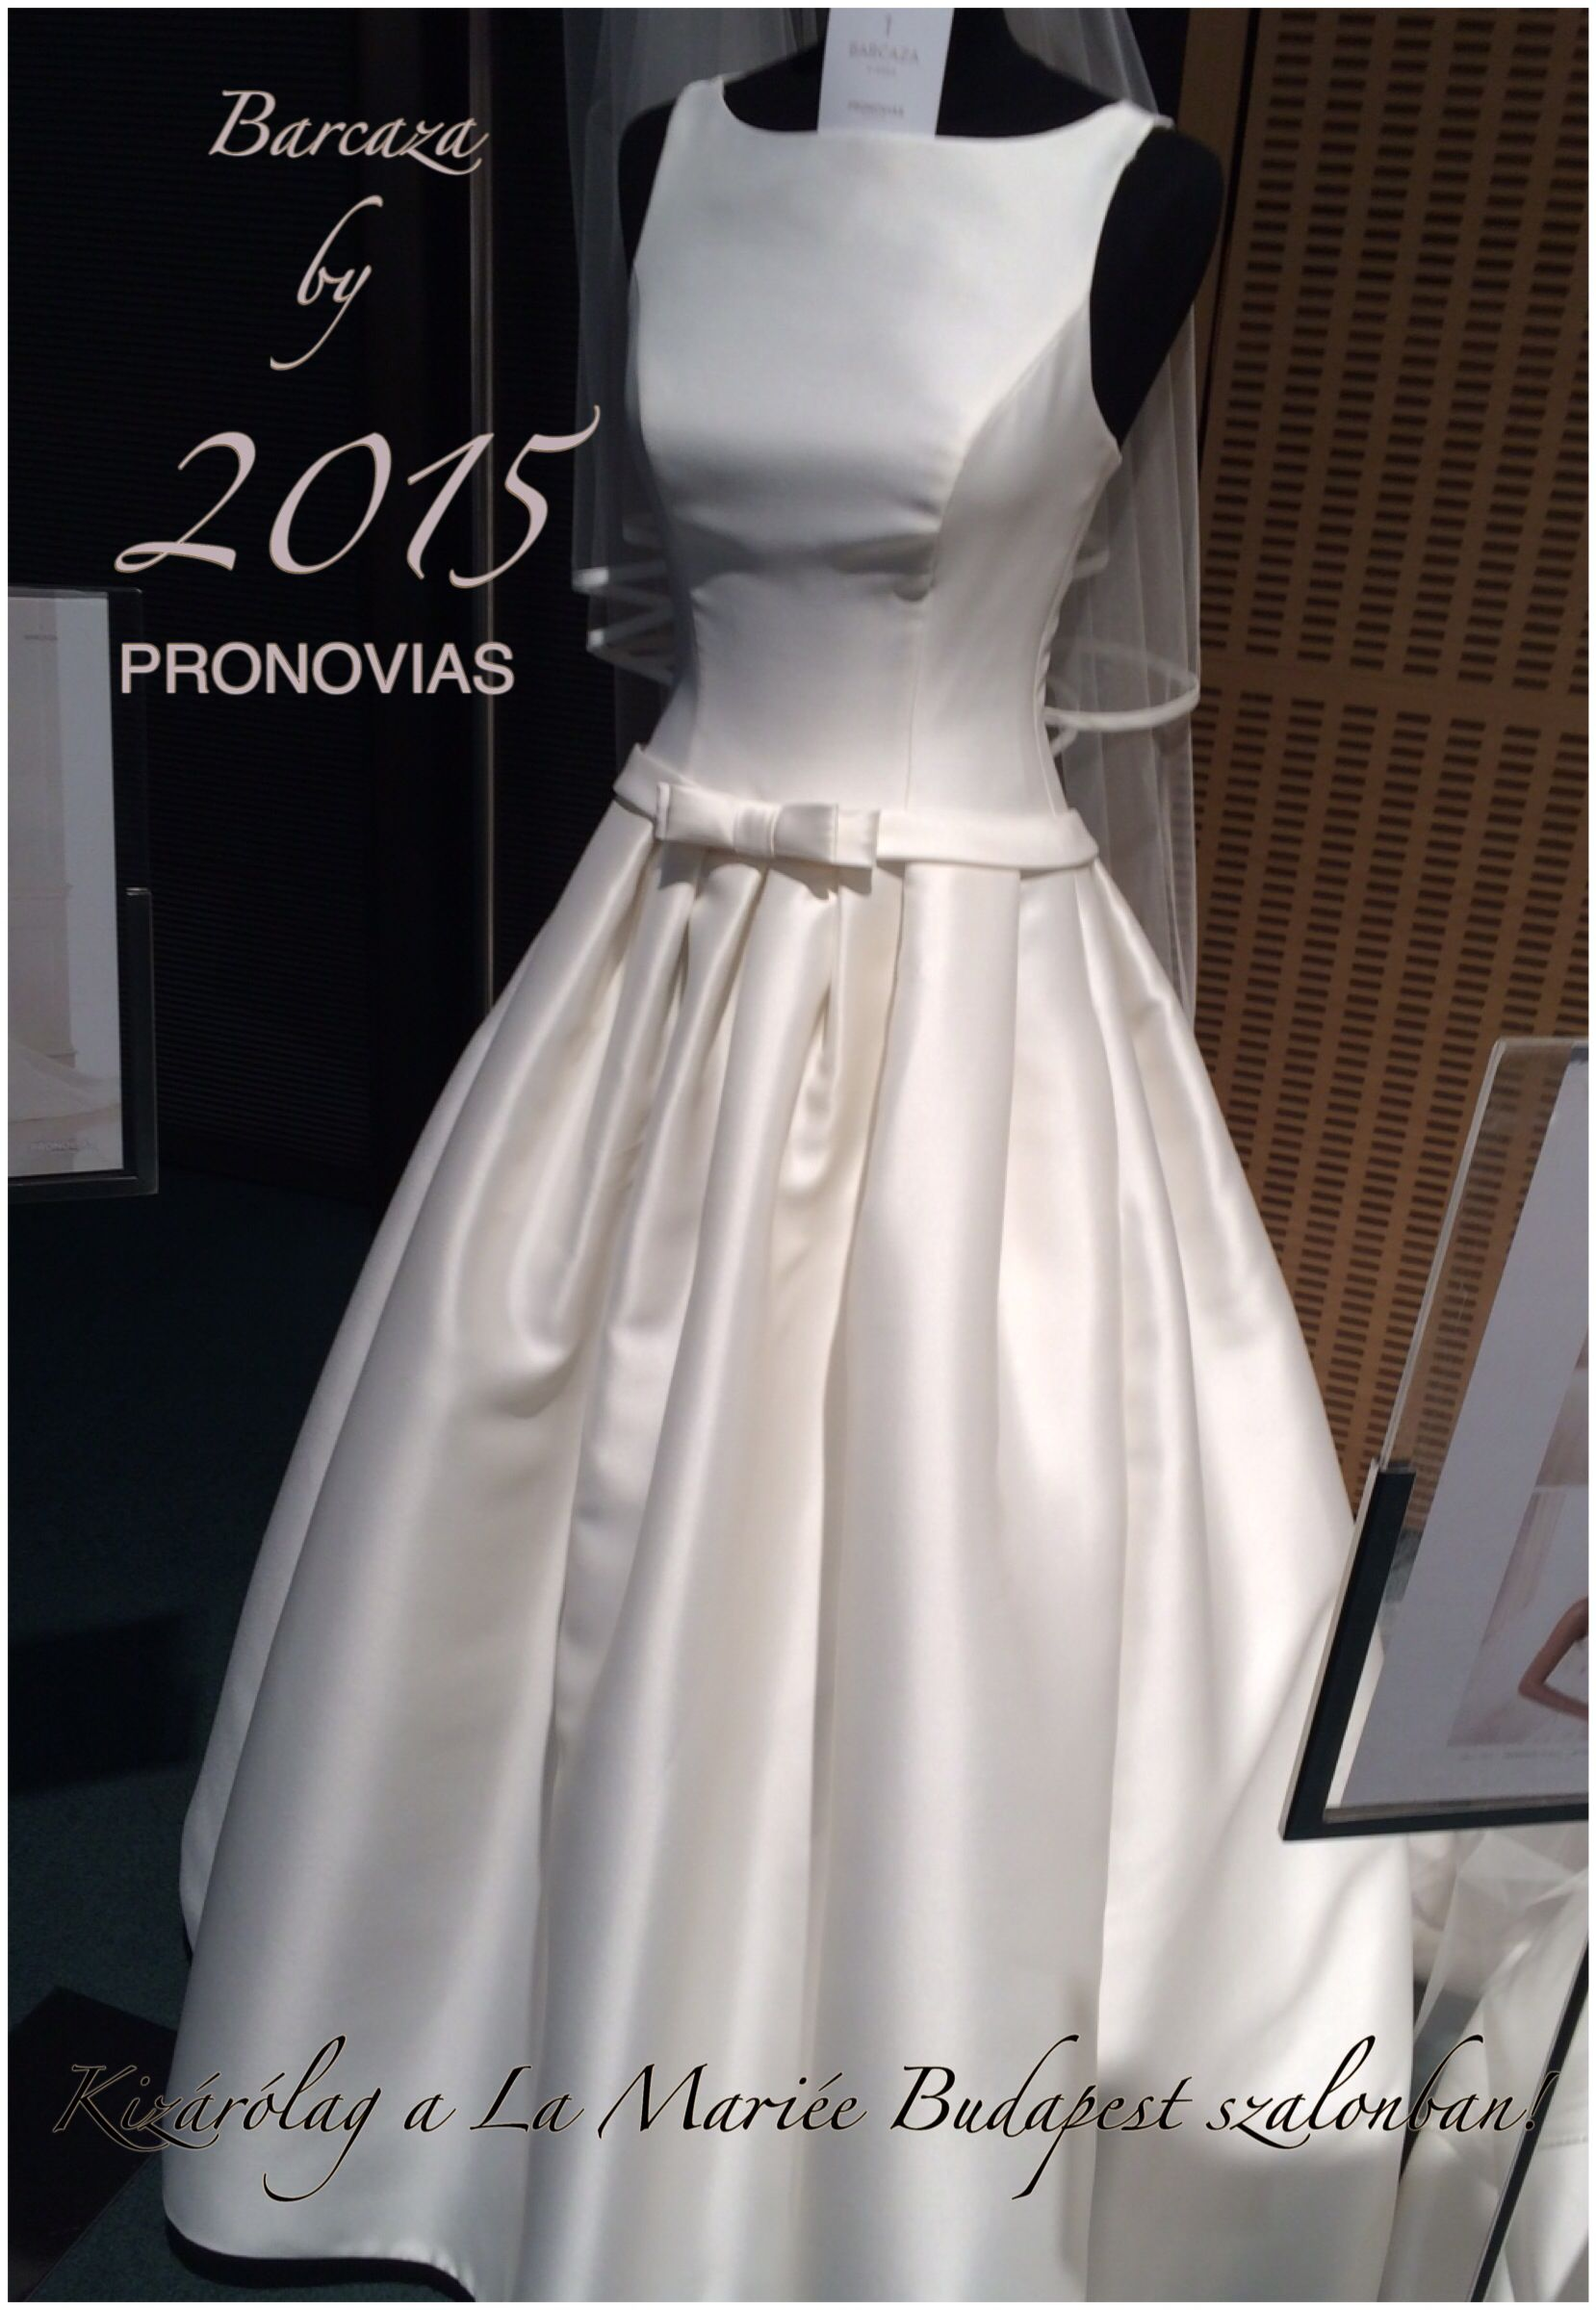 Barcaza esküvői ruha by 2015 PRONOVIAS http   lamariee.hu eskuvoi- 62d0283095